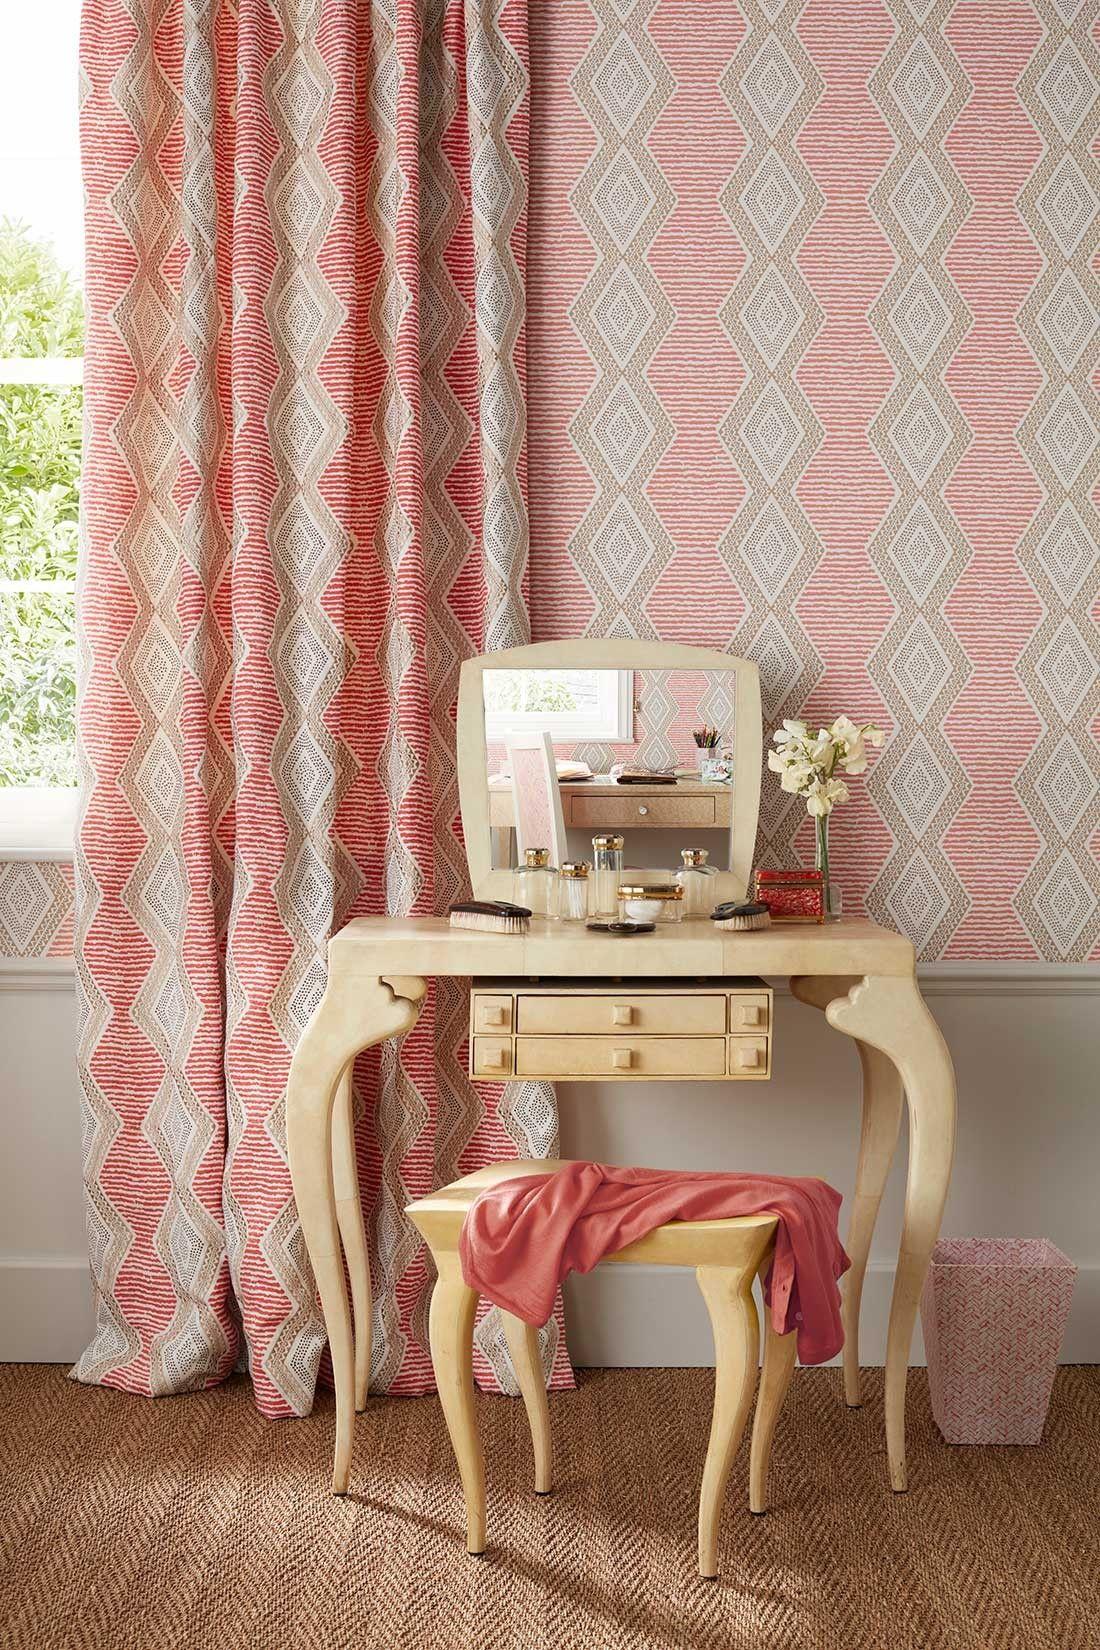 Belle Île Nina Campbell Pink interiors design, Beige